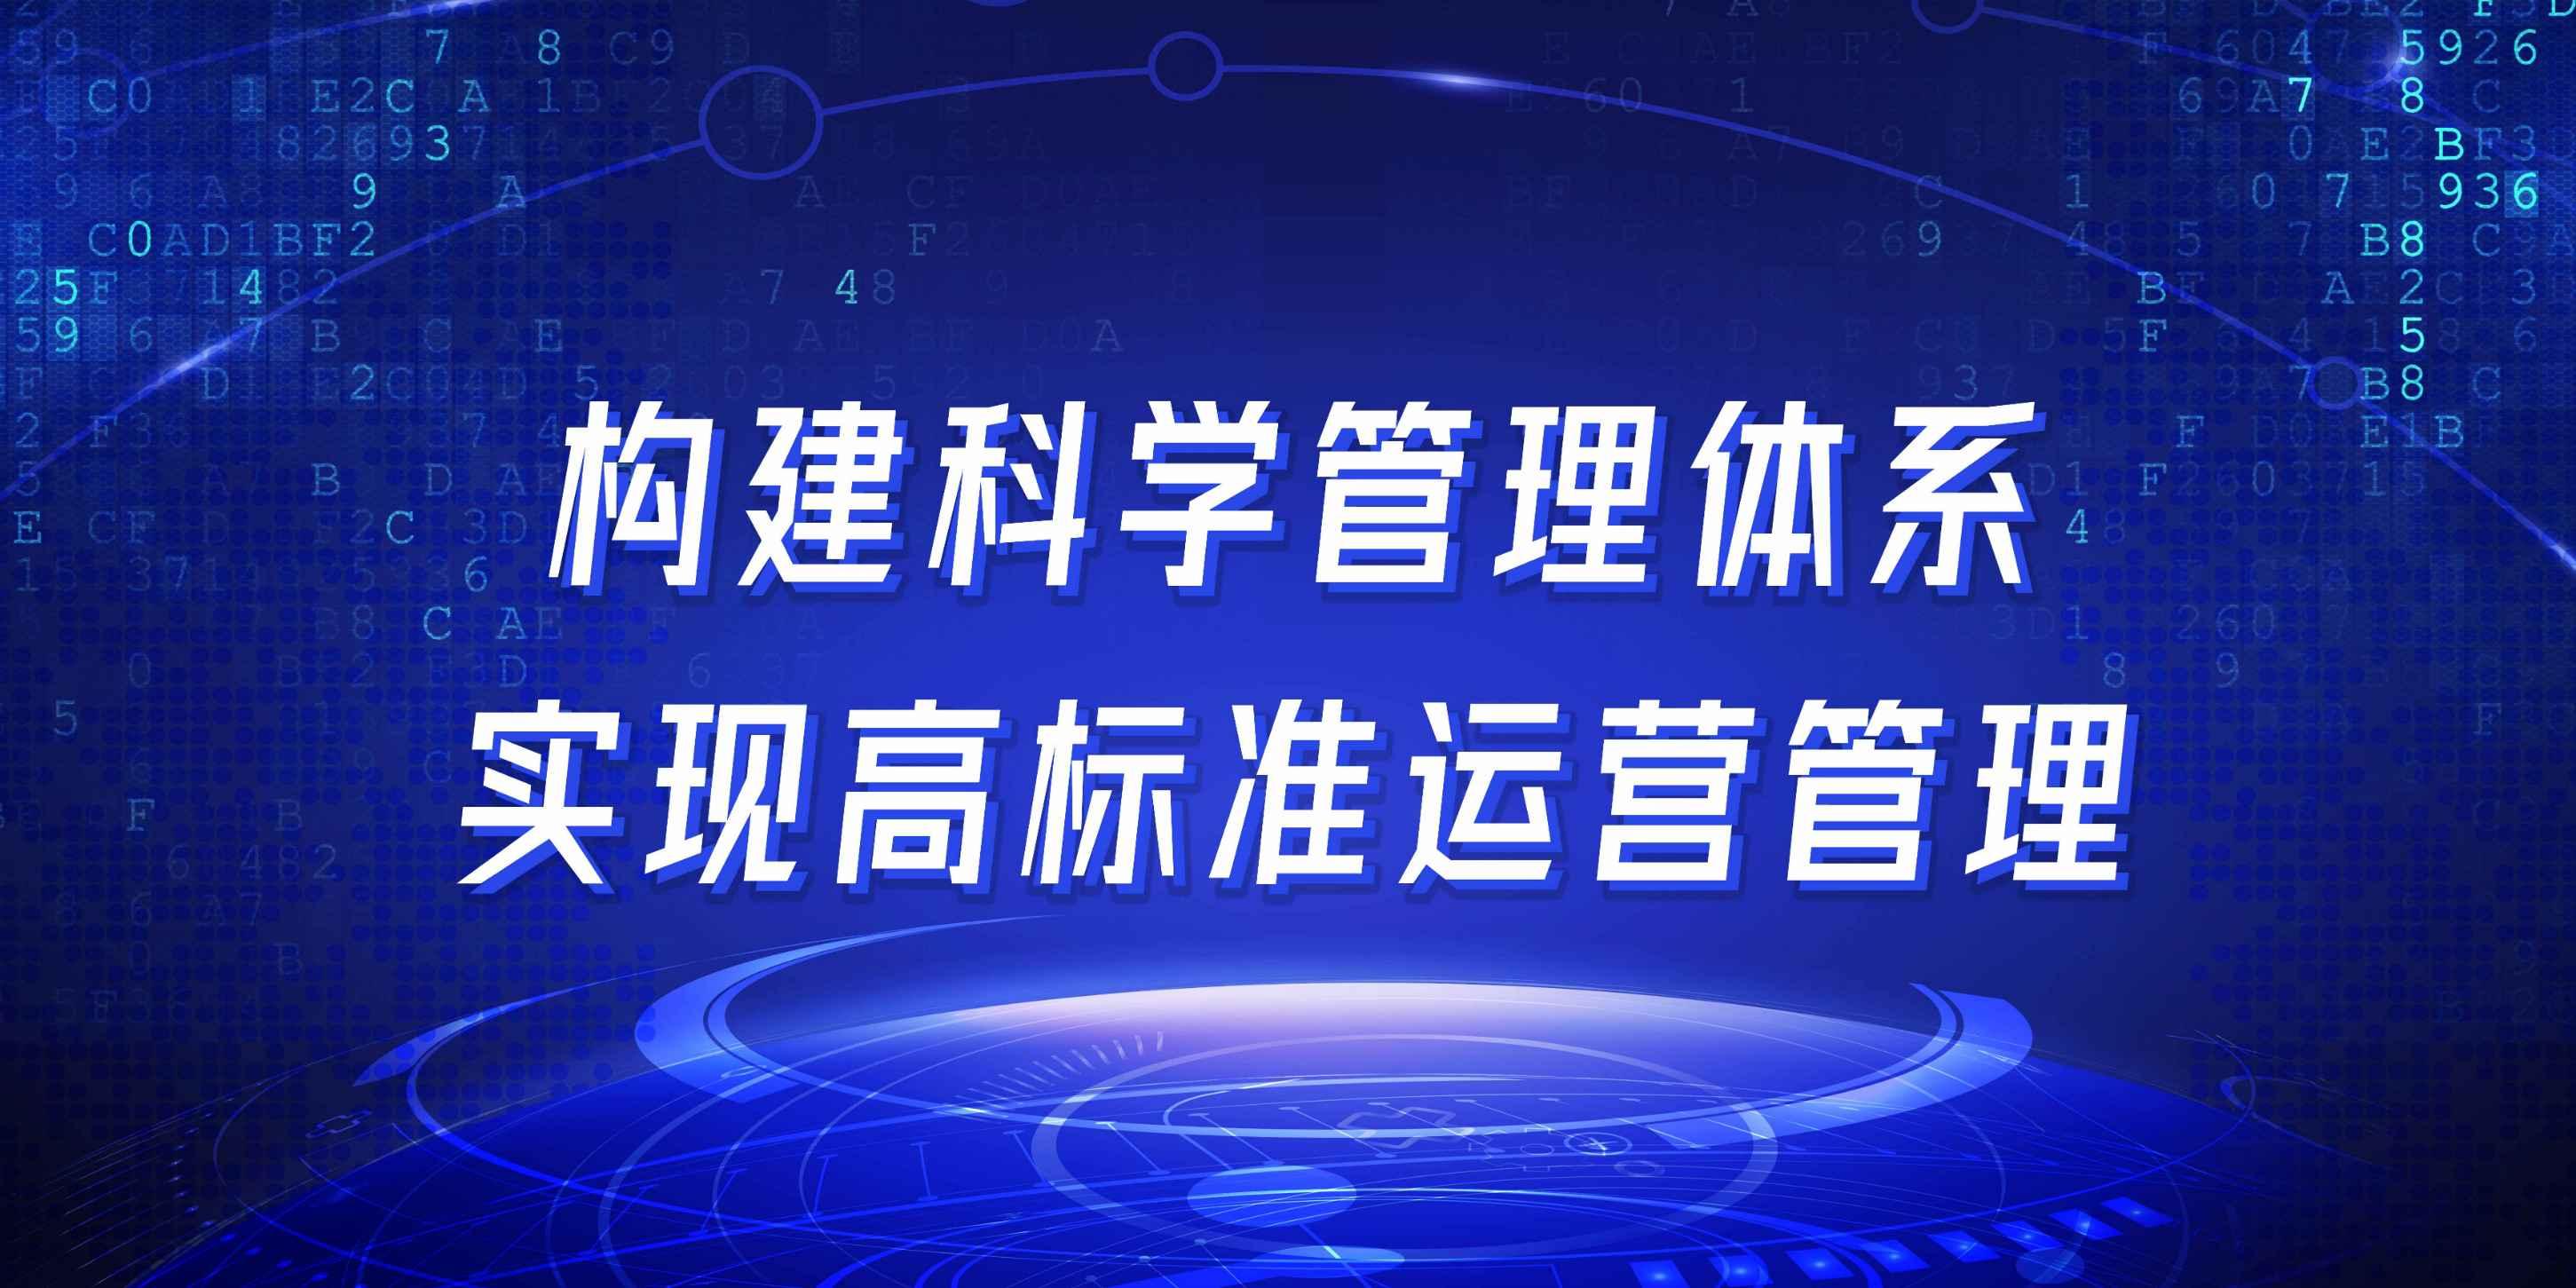 https://timcloud.oss-cn-shanghai.aliyuncs.com/file/iot4/picture/2021/8/24/1629788907351.jpg